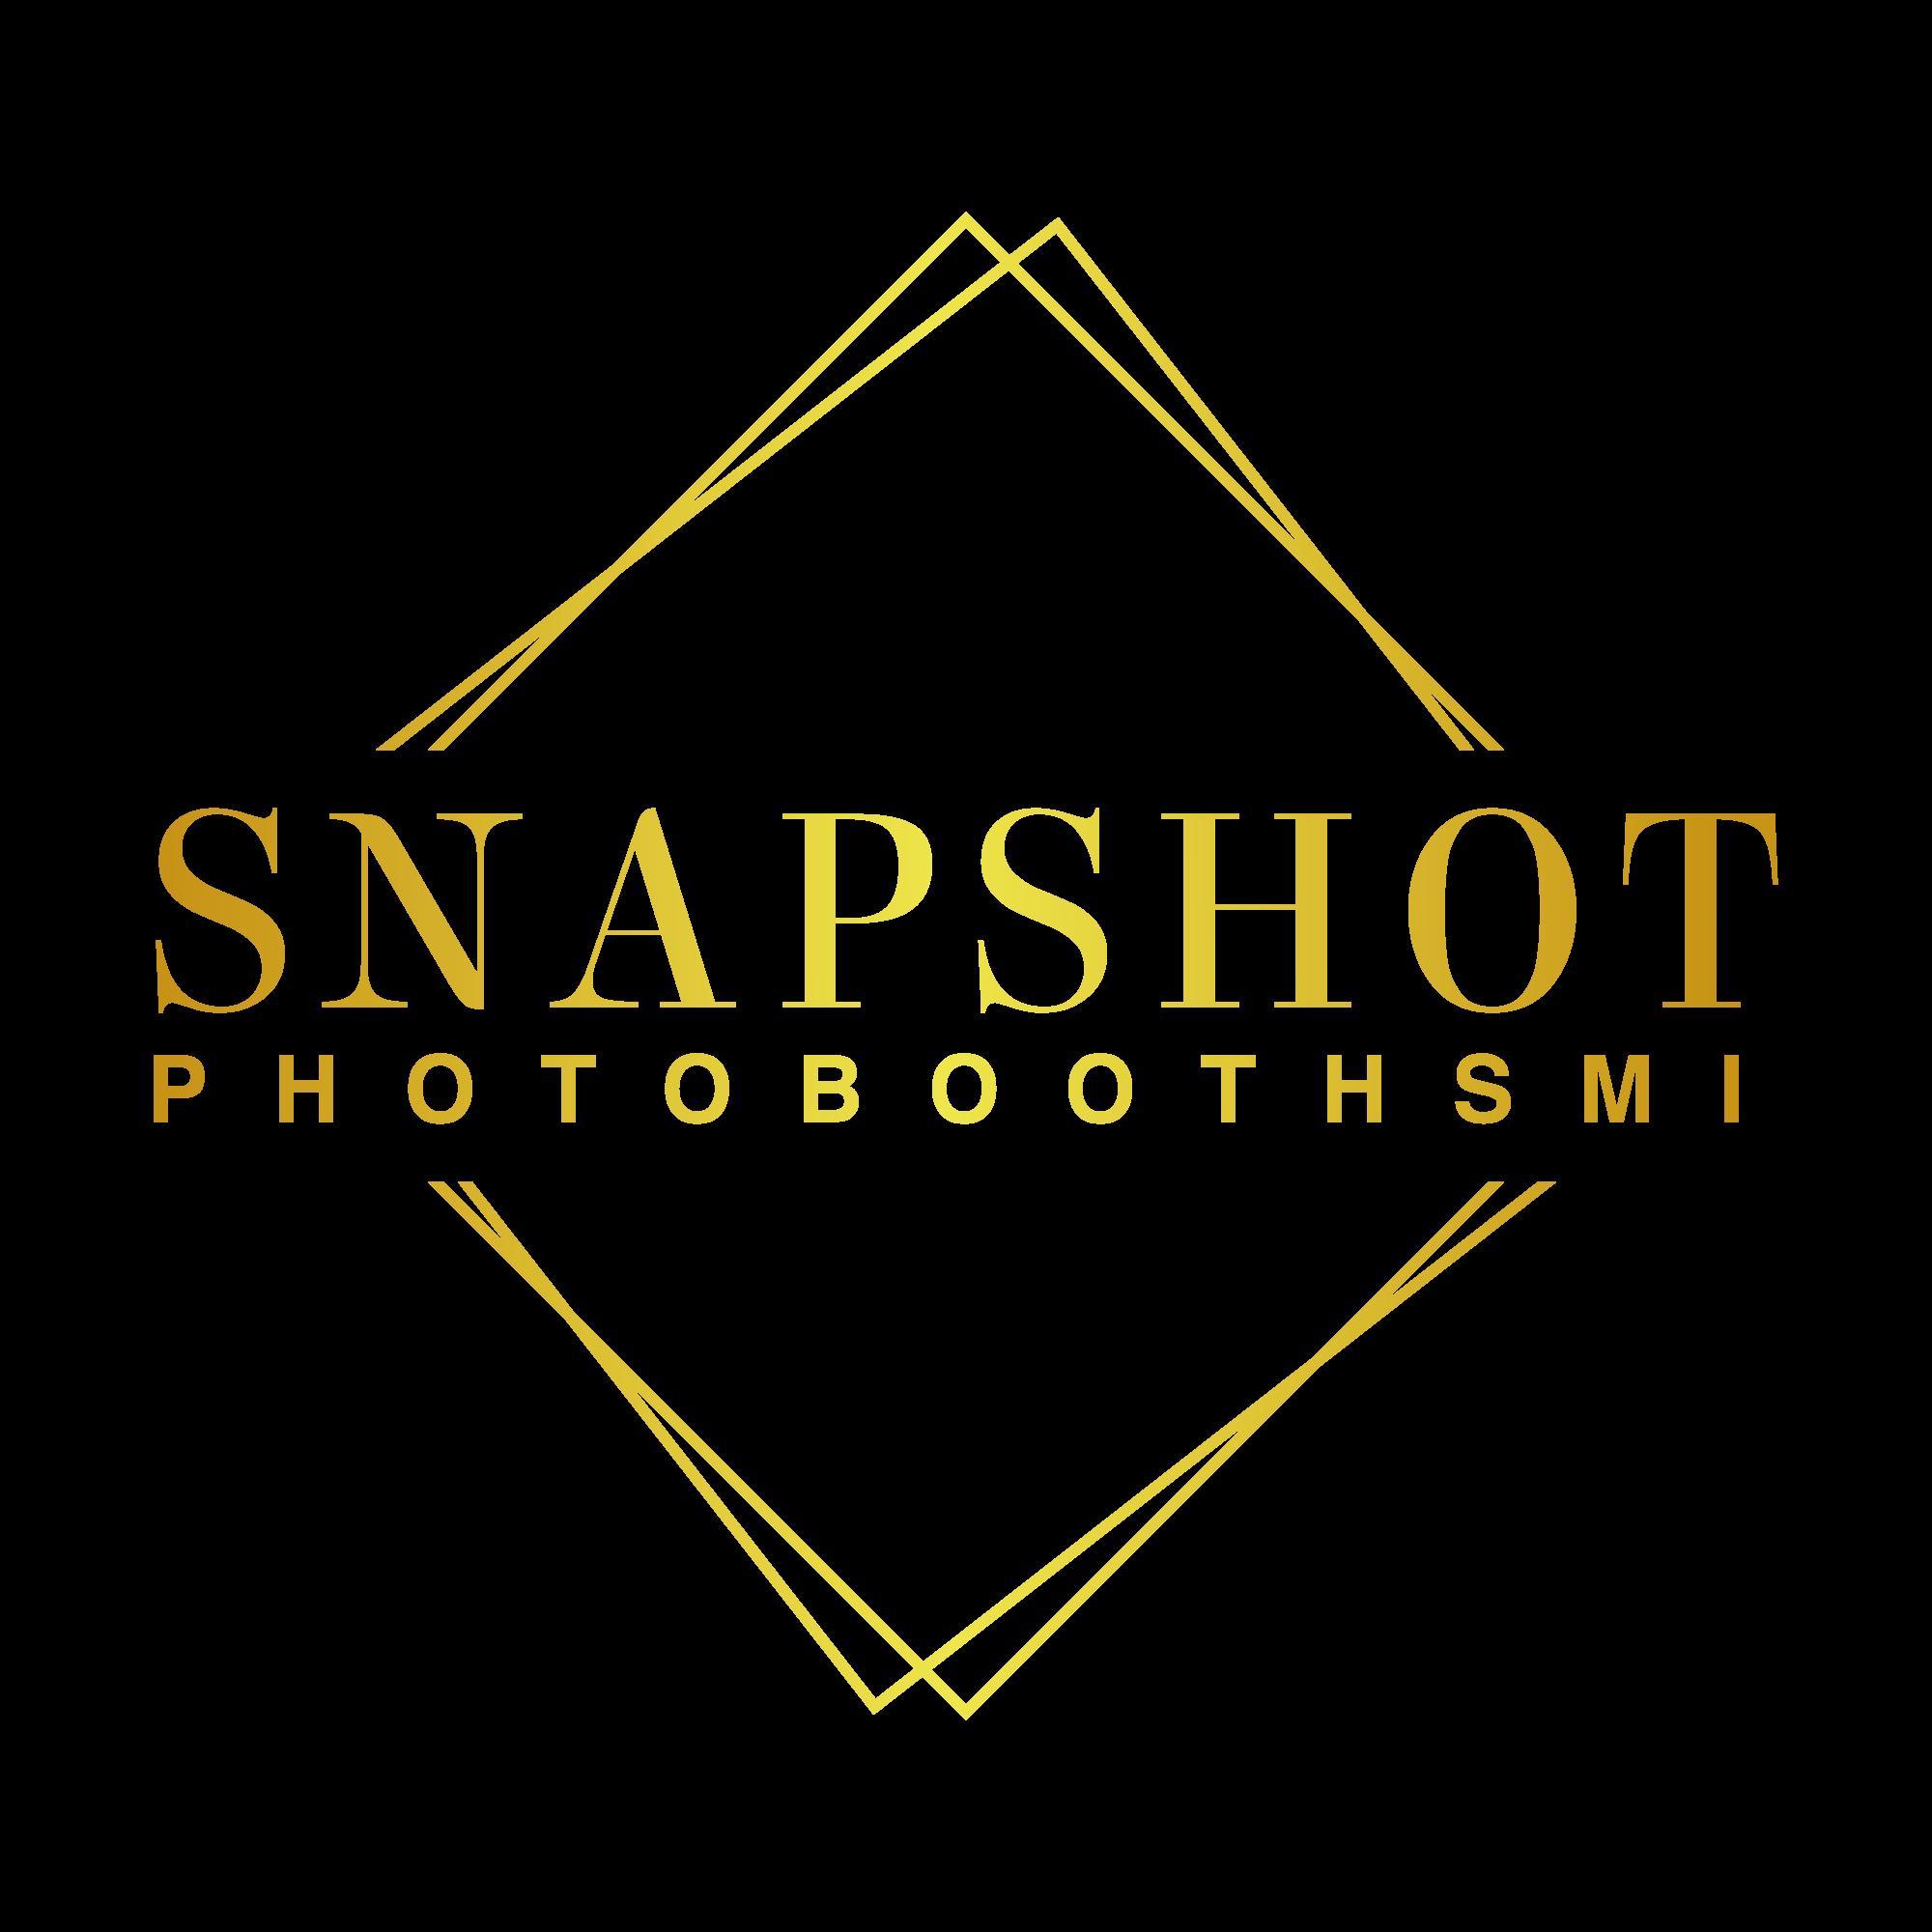 snapshotphotoboothsmi-logo-A.png